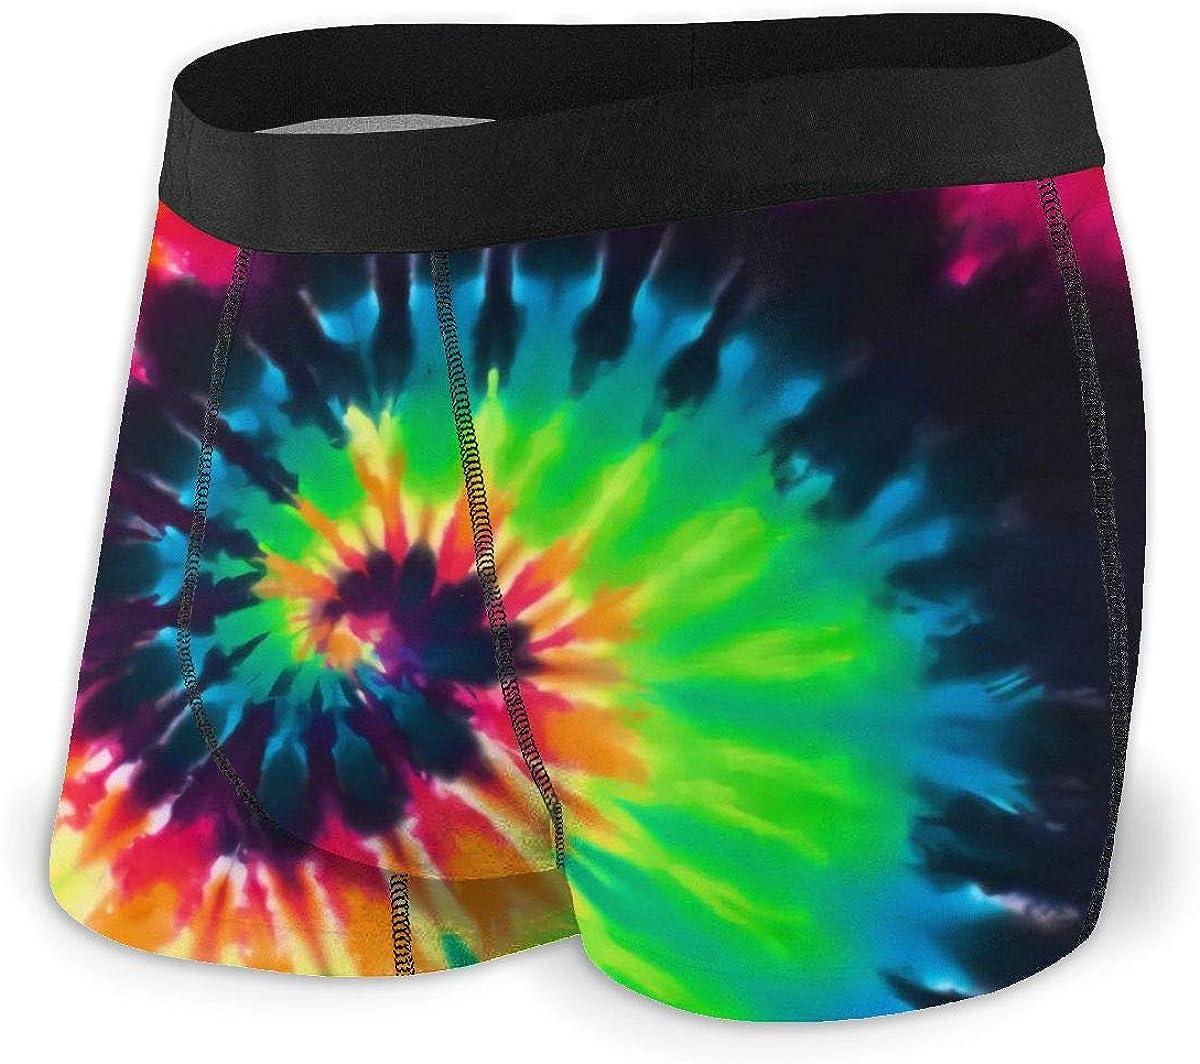 Kansas City Mall N-A Men's Boxer Briefs Ranking TOP11 Breathable Stretch Trunk Underwear